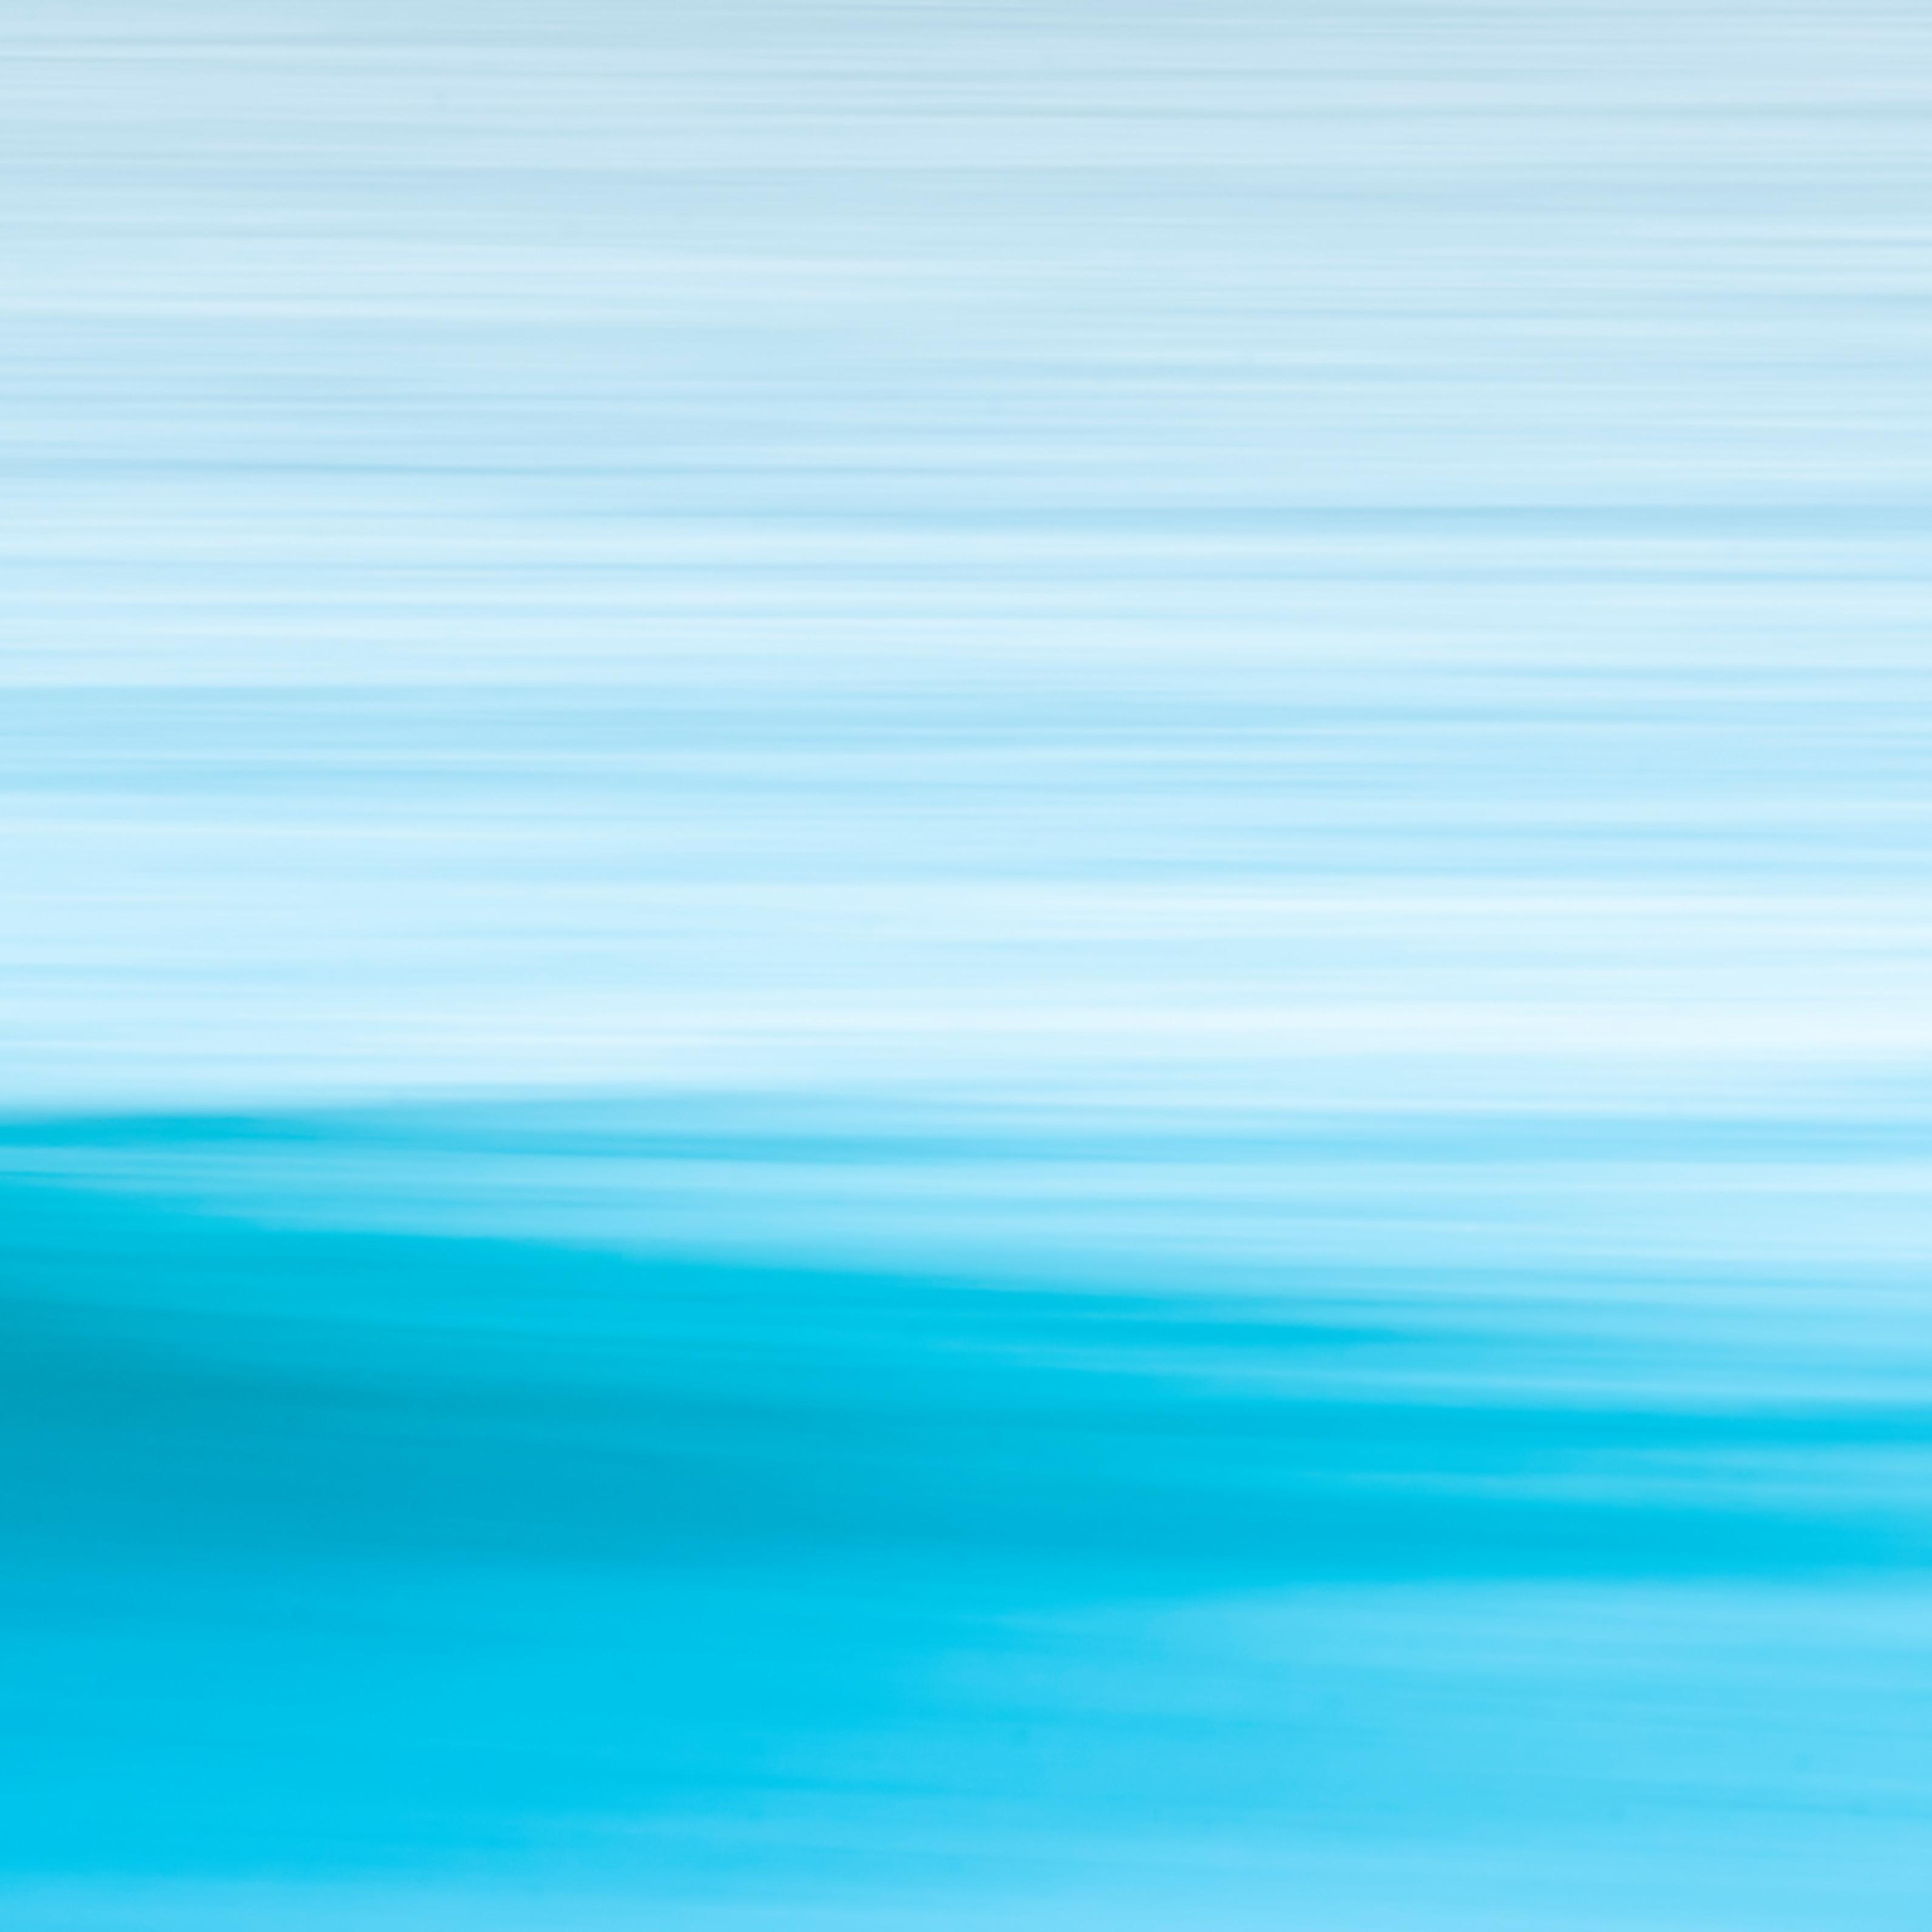 Abstract ocean hxdubd